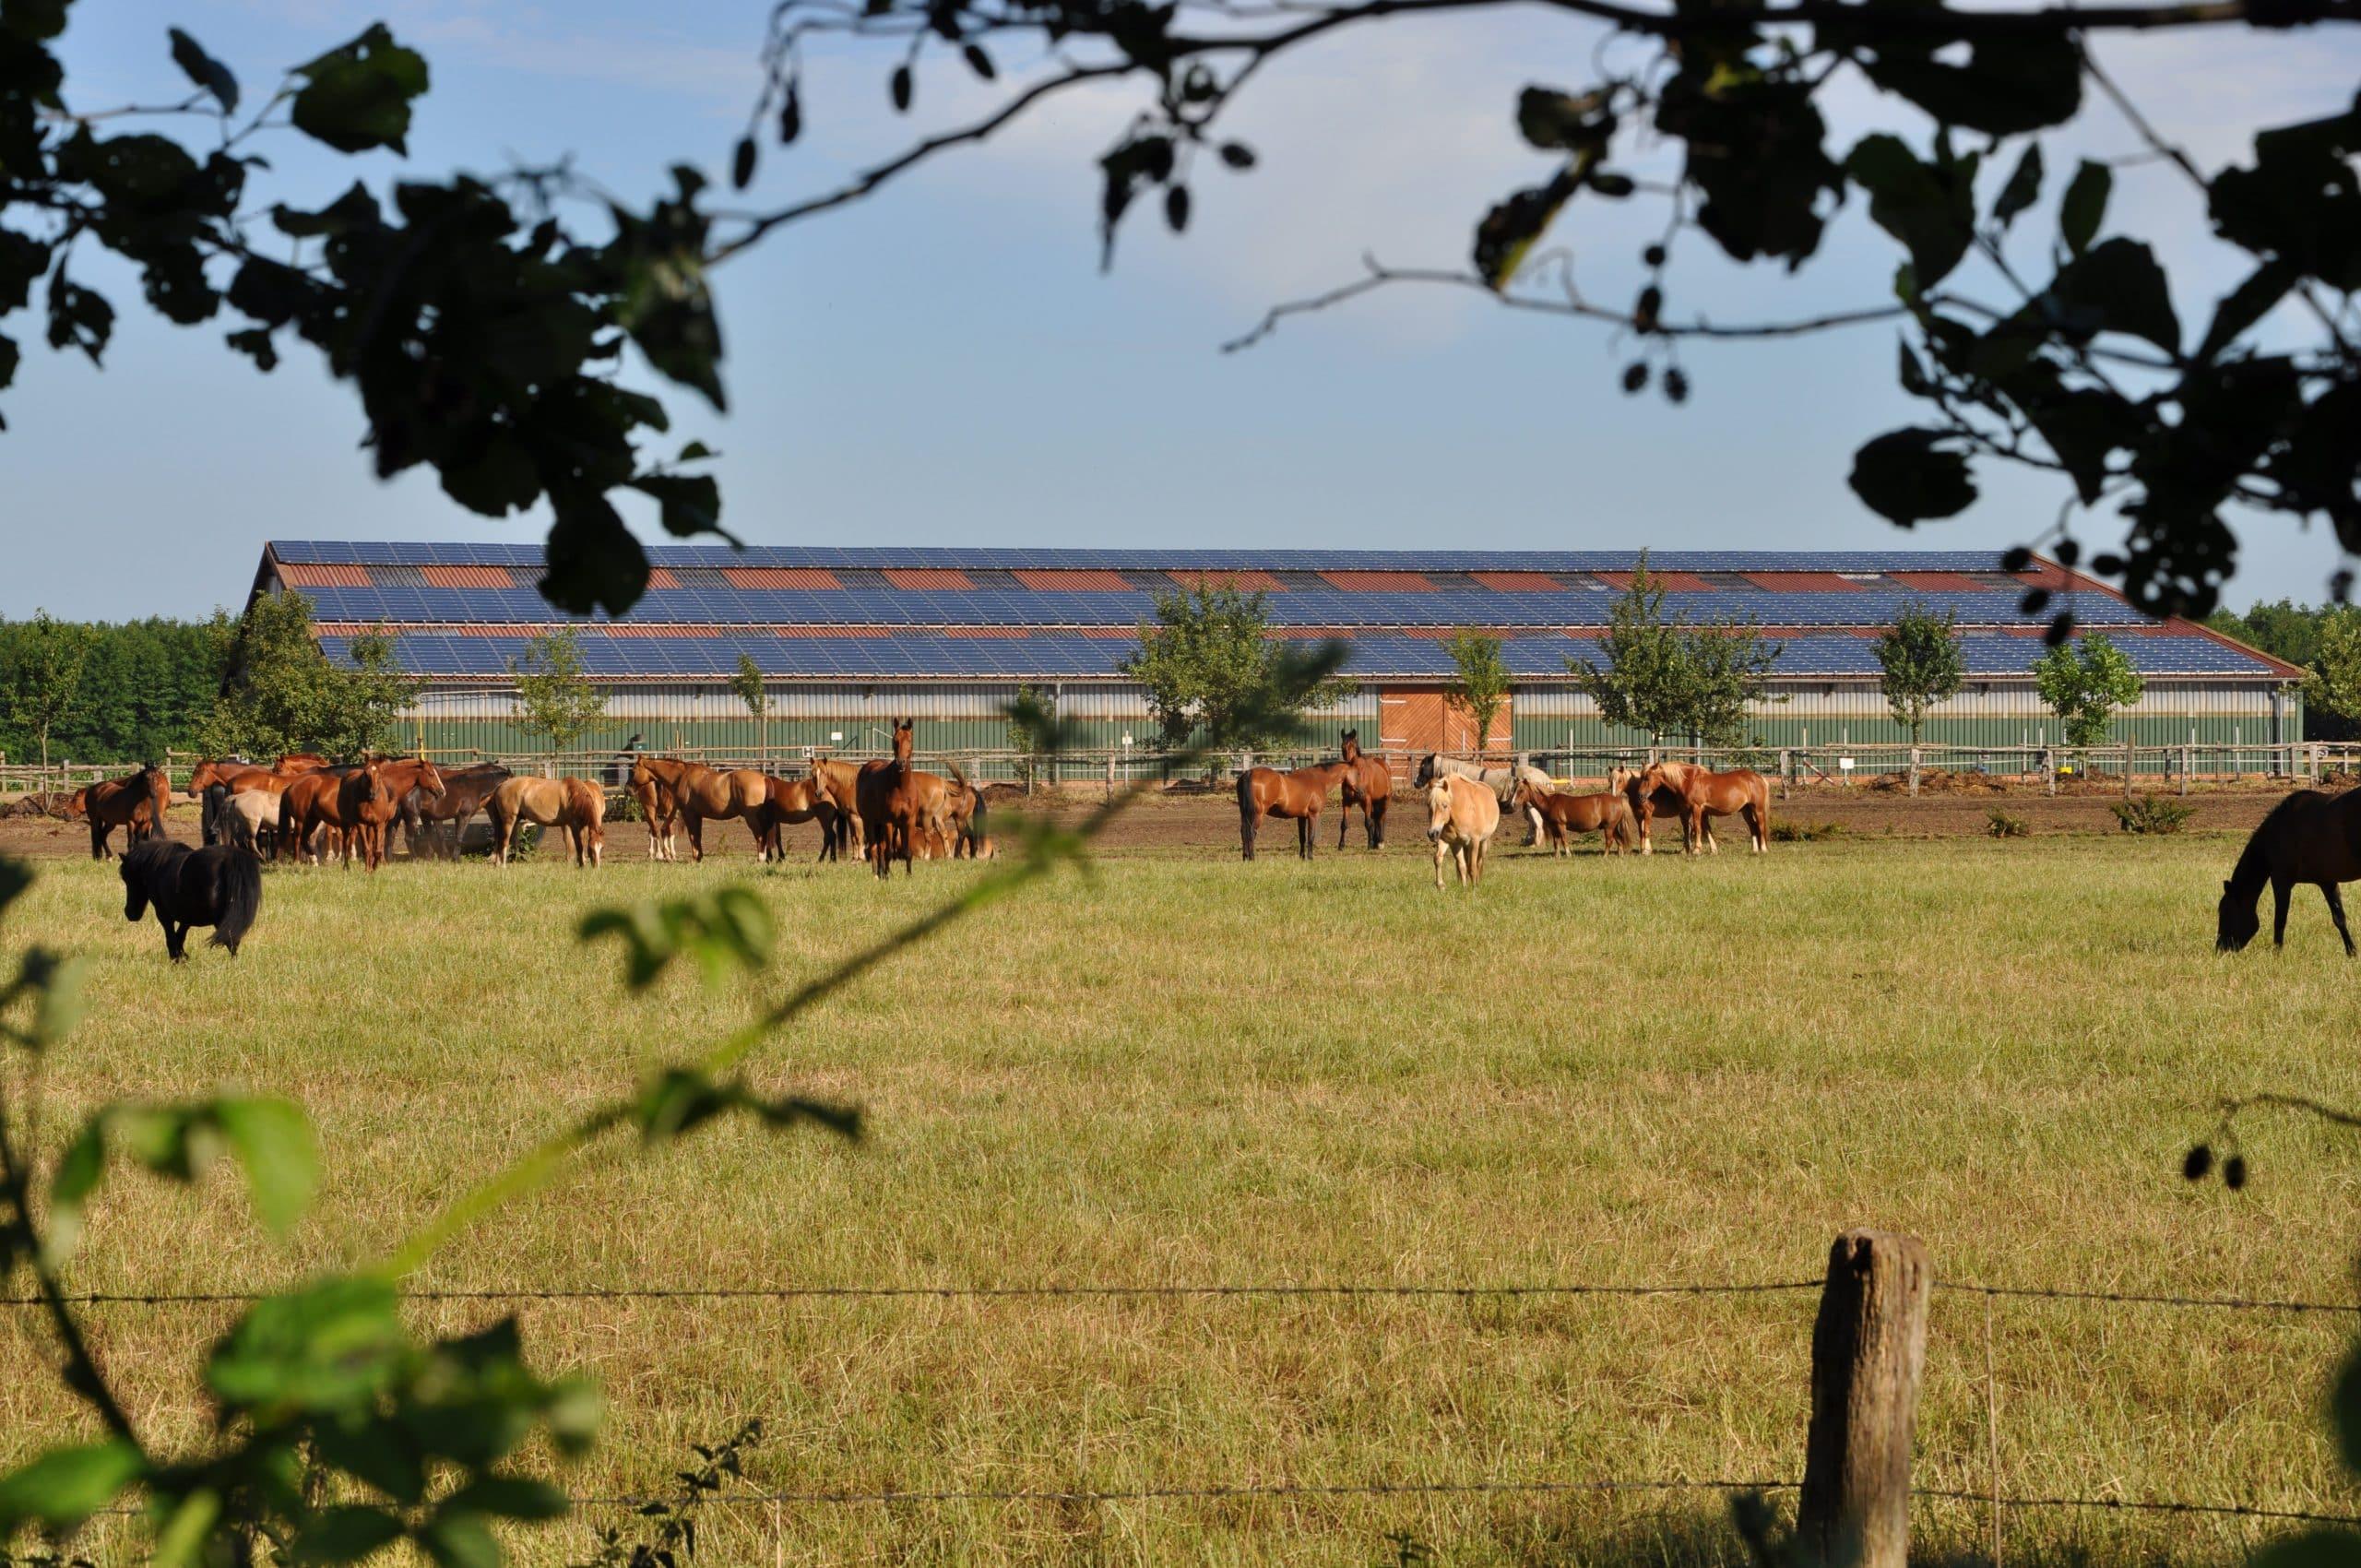 Familienurlaub Reiturlaub Familotel Gut Landegge Emsland Pferdekoppel